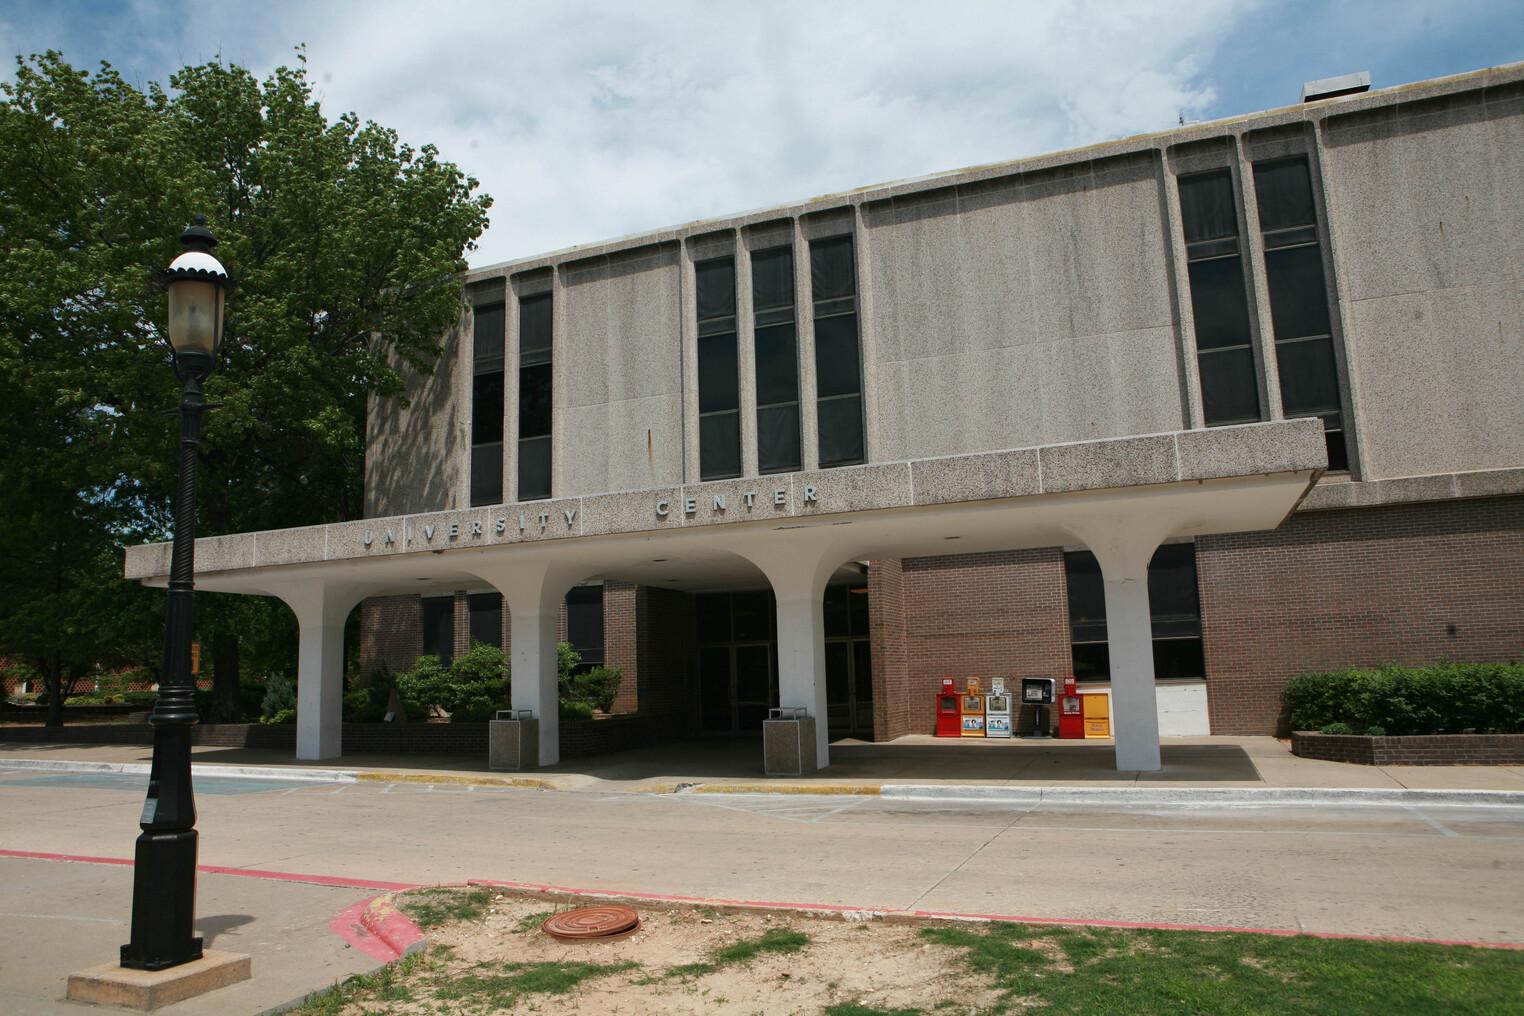 University Center - Tahlequah